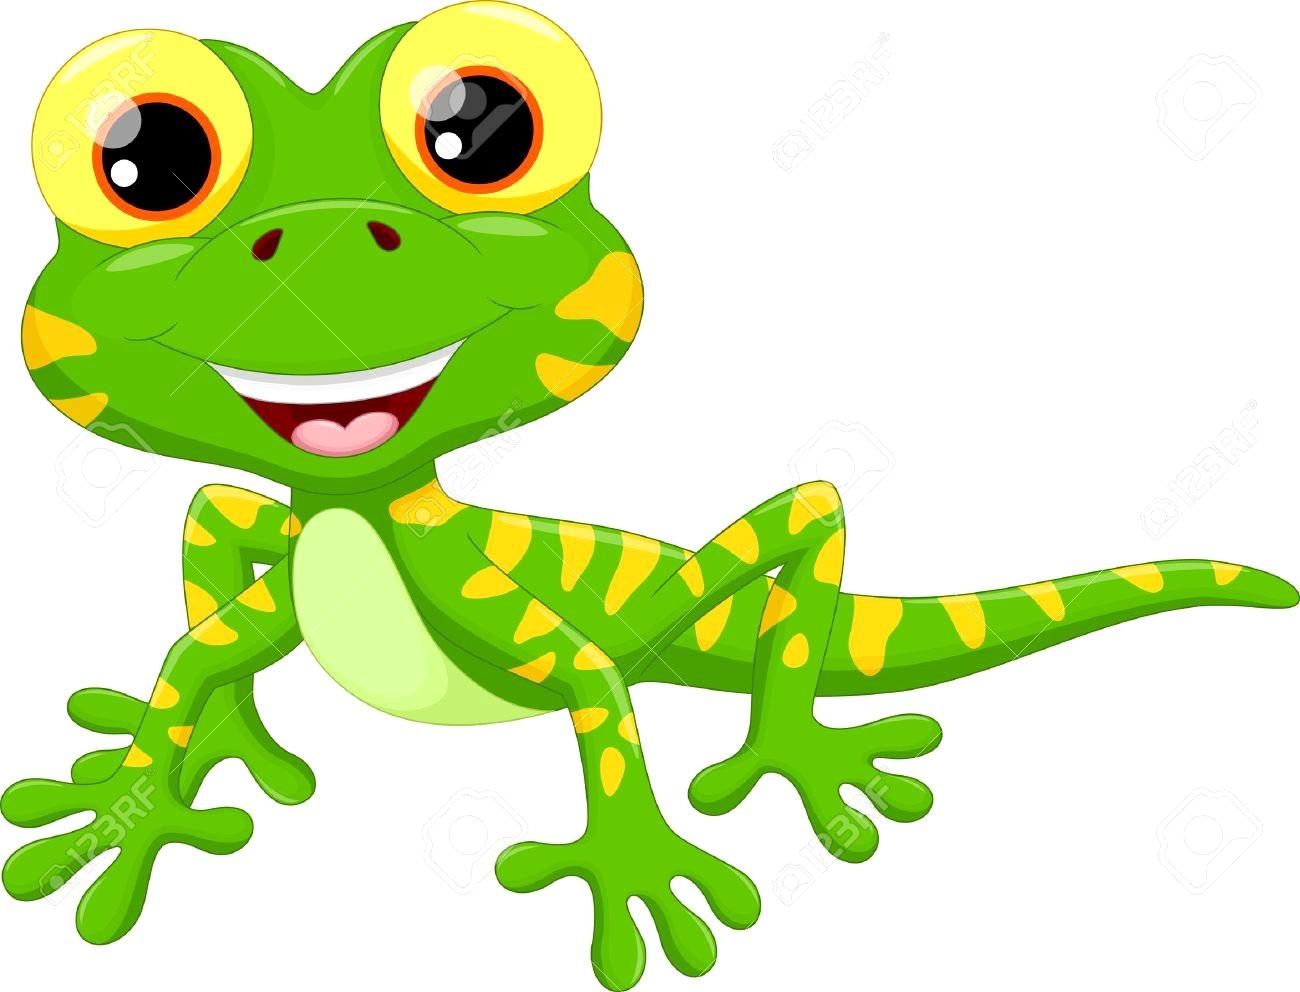 Lizard clipart cool, Lizard cool Transparent FREE for.